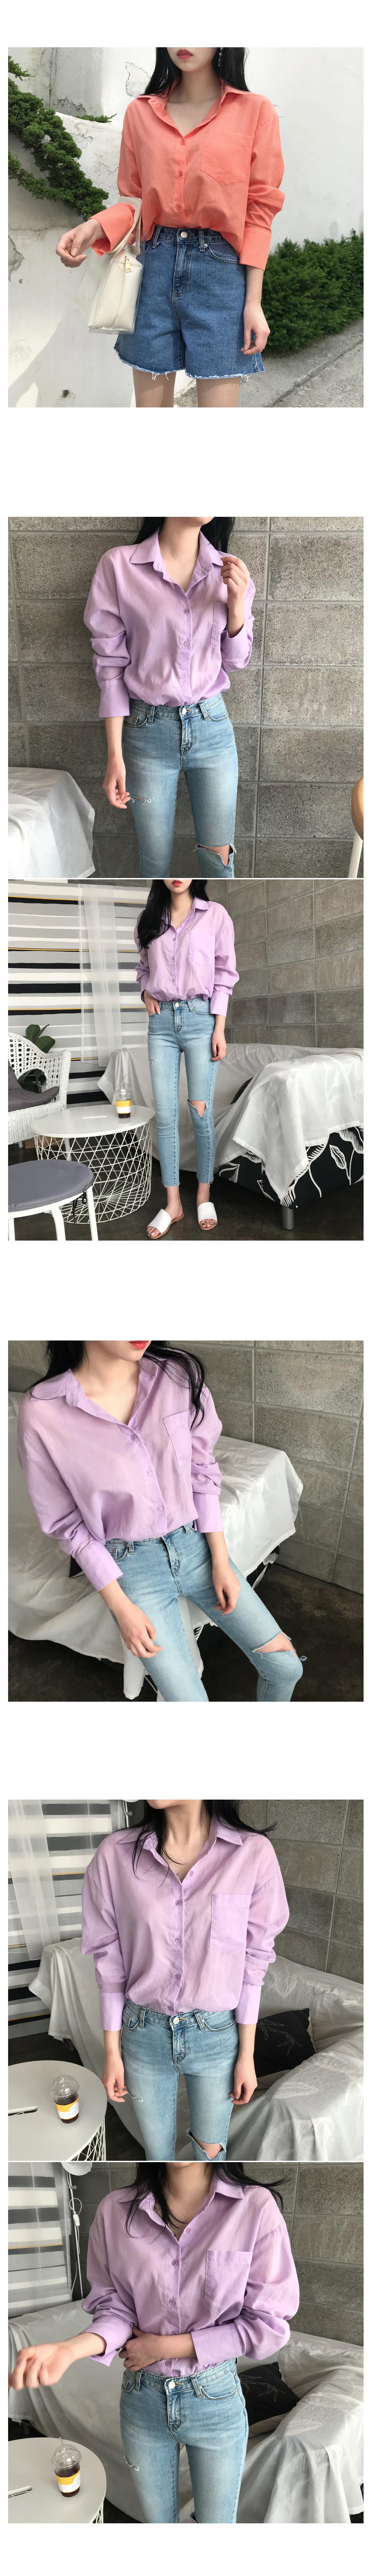 Milo Summer Cotton Shirt